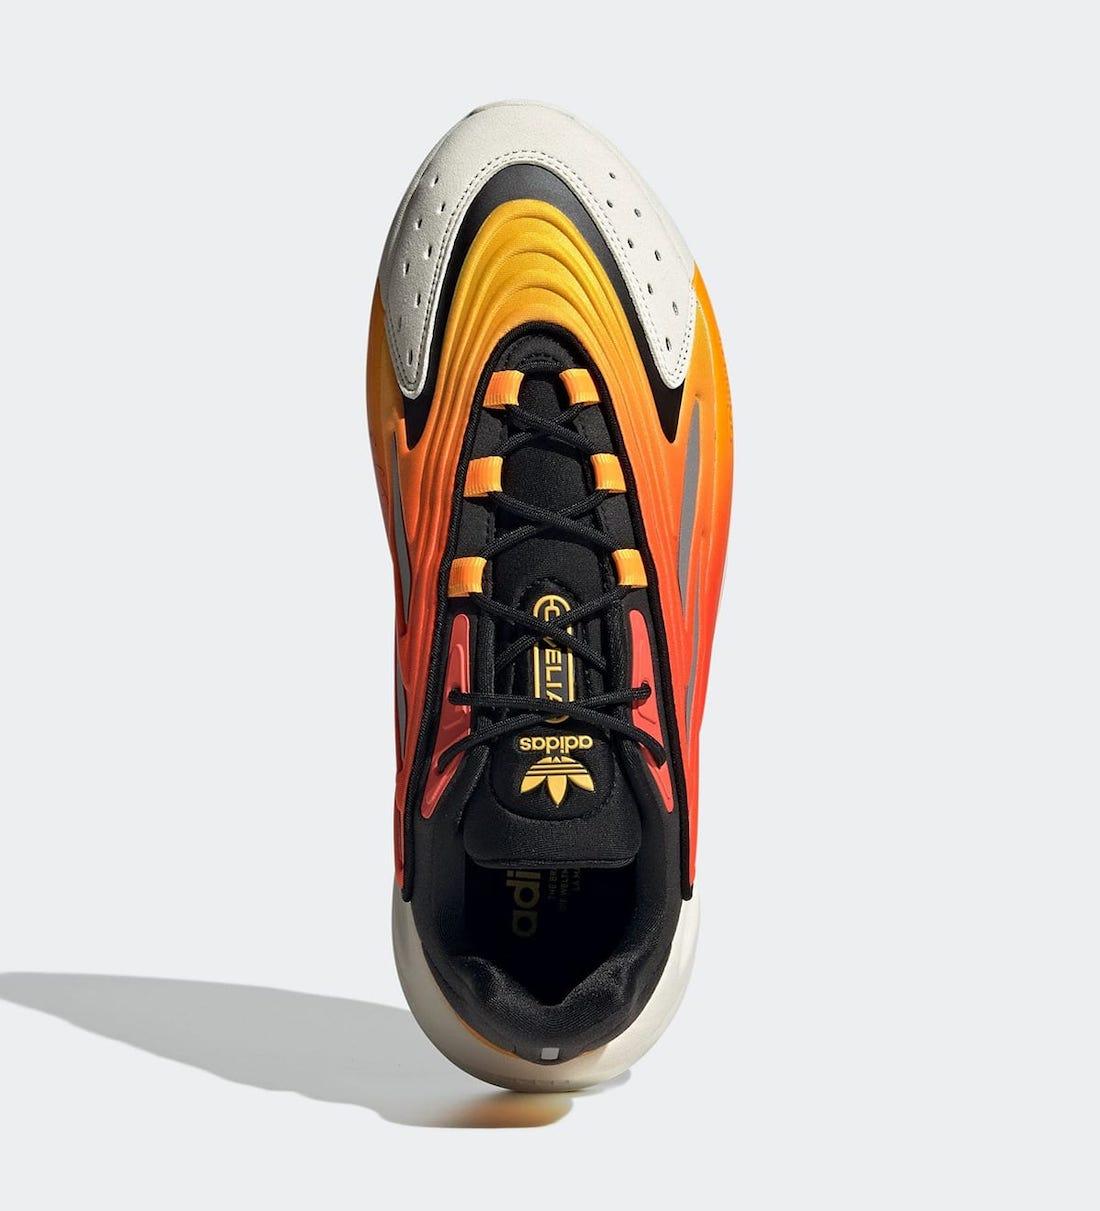 adidas,Ozelia  又一双 Yeezy 平替?!adidas 发布全新鞋型你打几分?